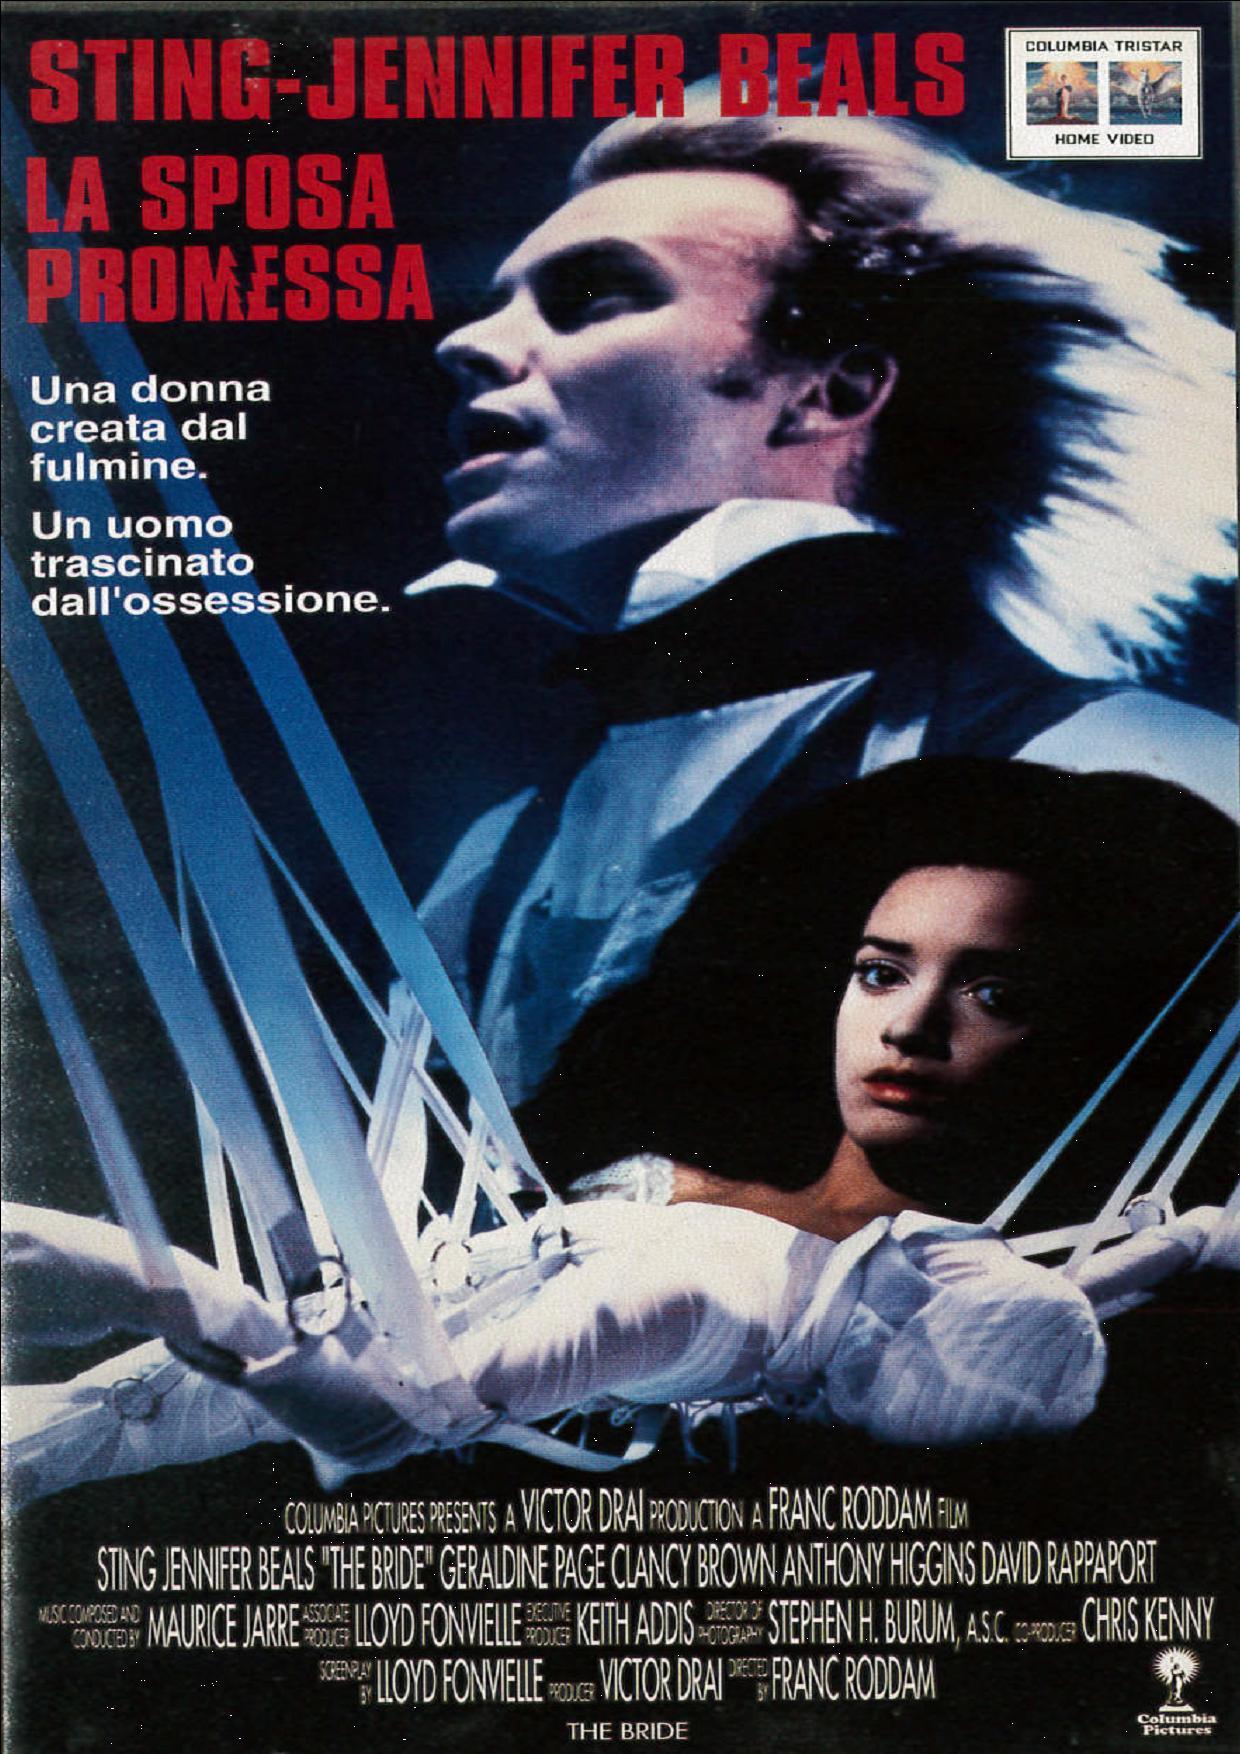 LA SPOSA PROMESSA (VHS) (VHS)